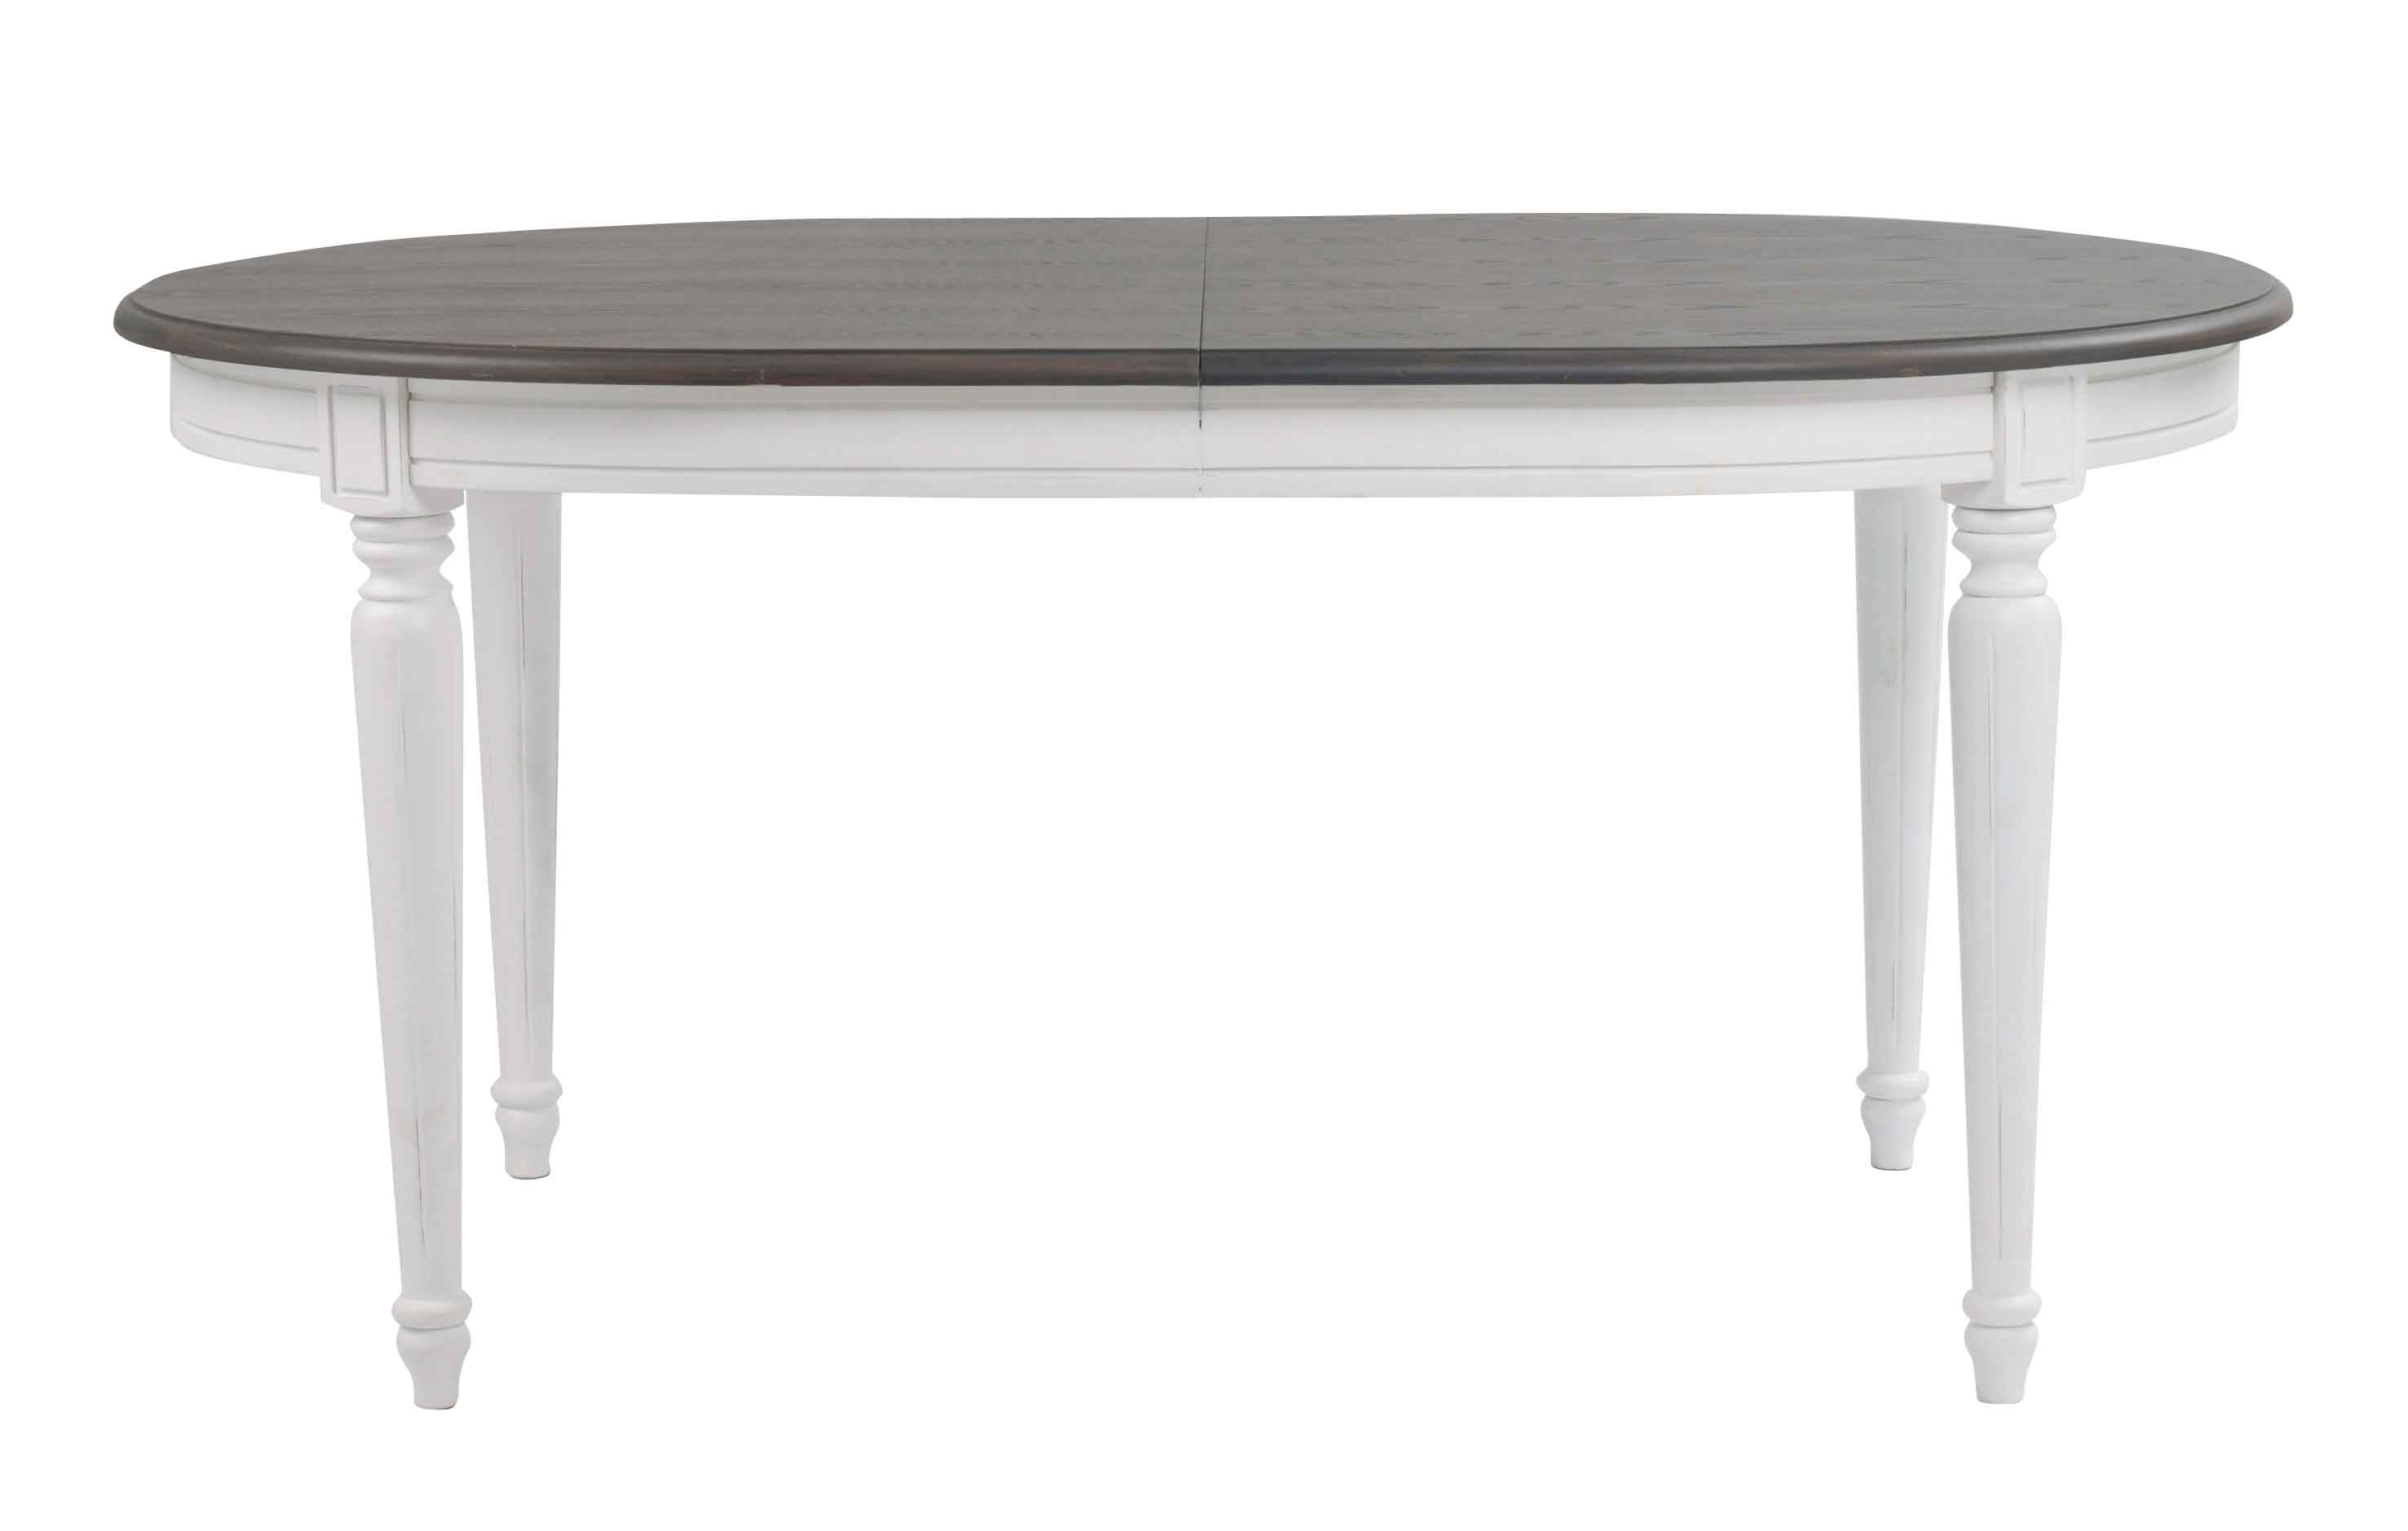 Viktoria spisebord - Grå bordplade, ovalt 160x105